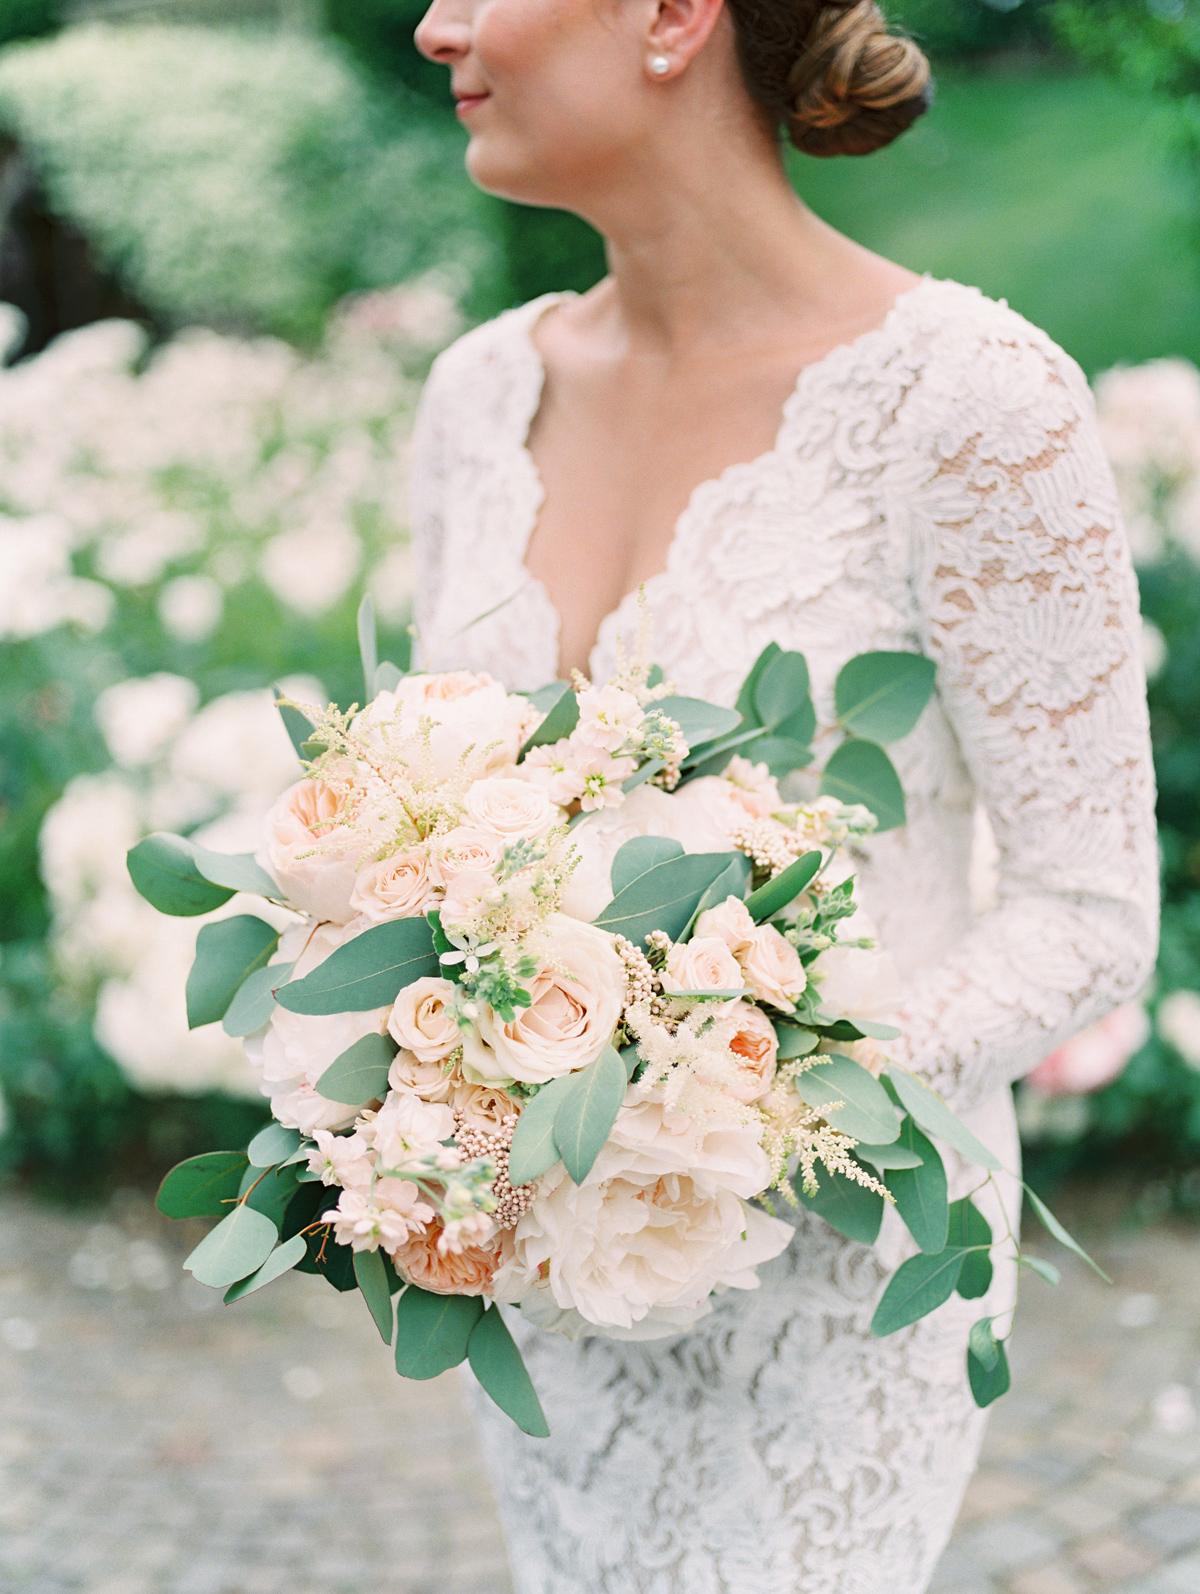 saghar ben wedding bride's bouquet